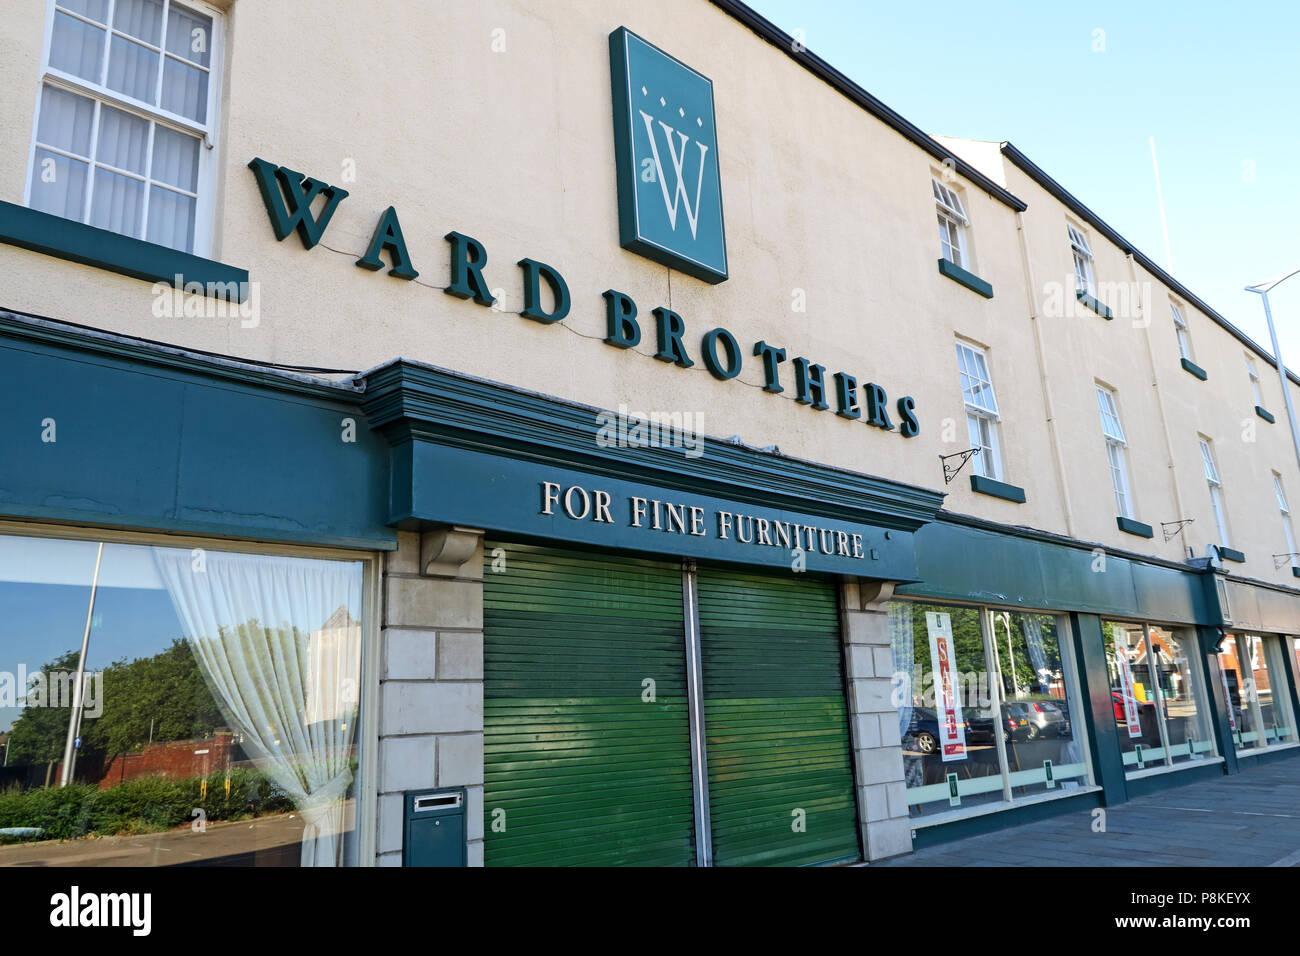 Dieses Stockfoto: Ward Brüder Möbelhaus, Doncaster, 29-40 Waterdale, Doncaster, Yorkshire, England, UK, DN1 3EY - P8KEYX